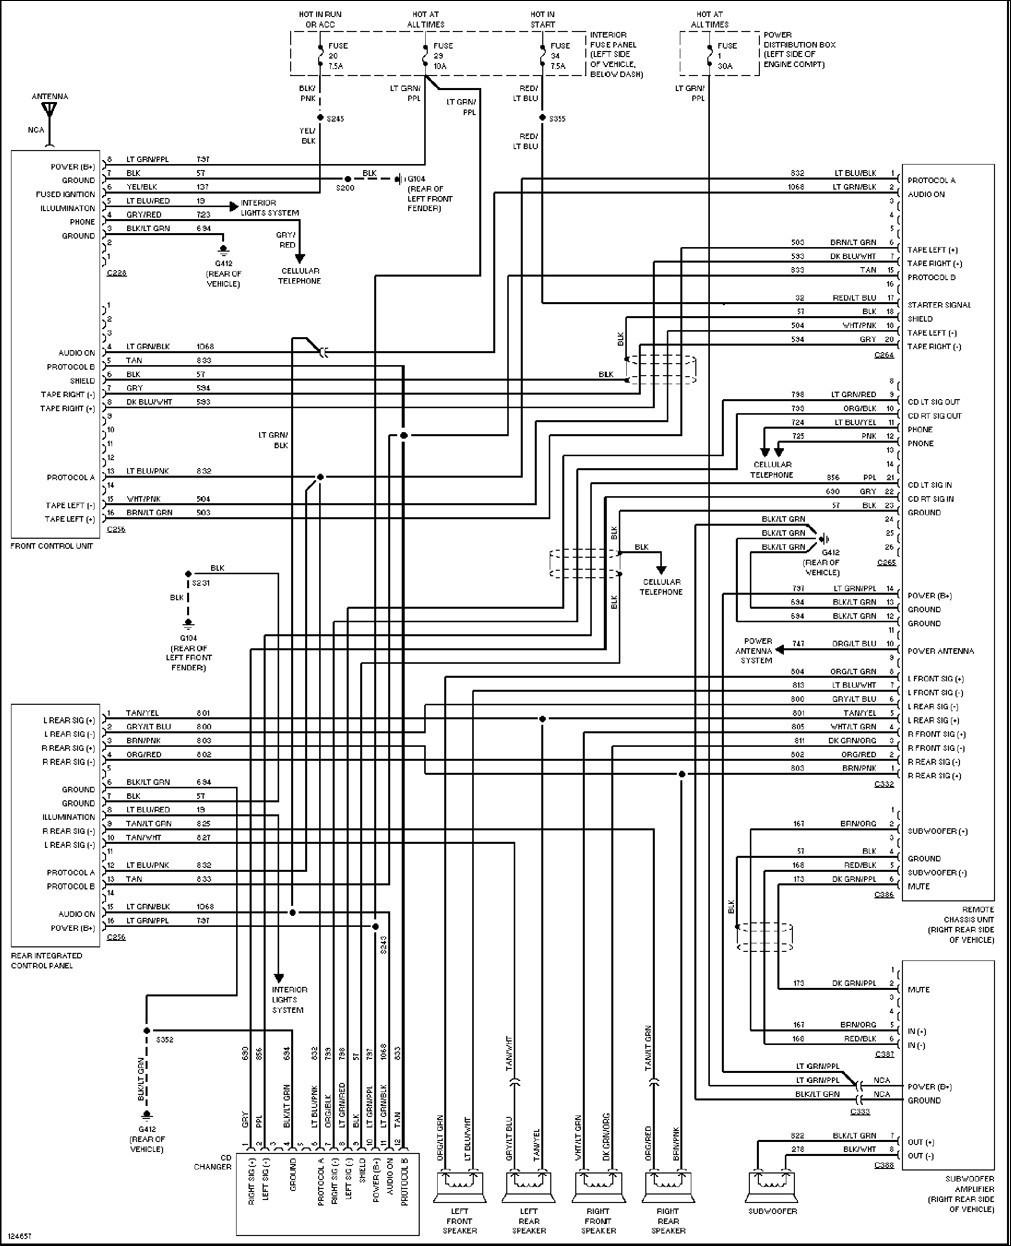 2001 Ford Ranger Radio Wiring Diagram Fresh Engine Fuel Pump 2008 - 2003 Ford Explorer Radio Wiring Diagram